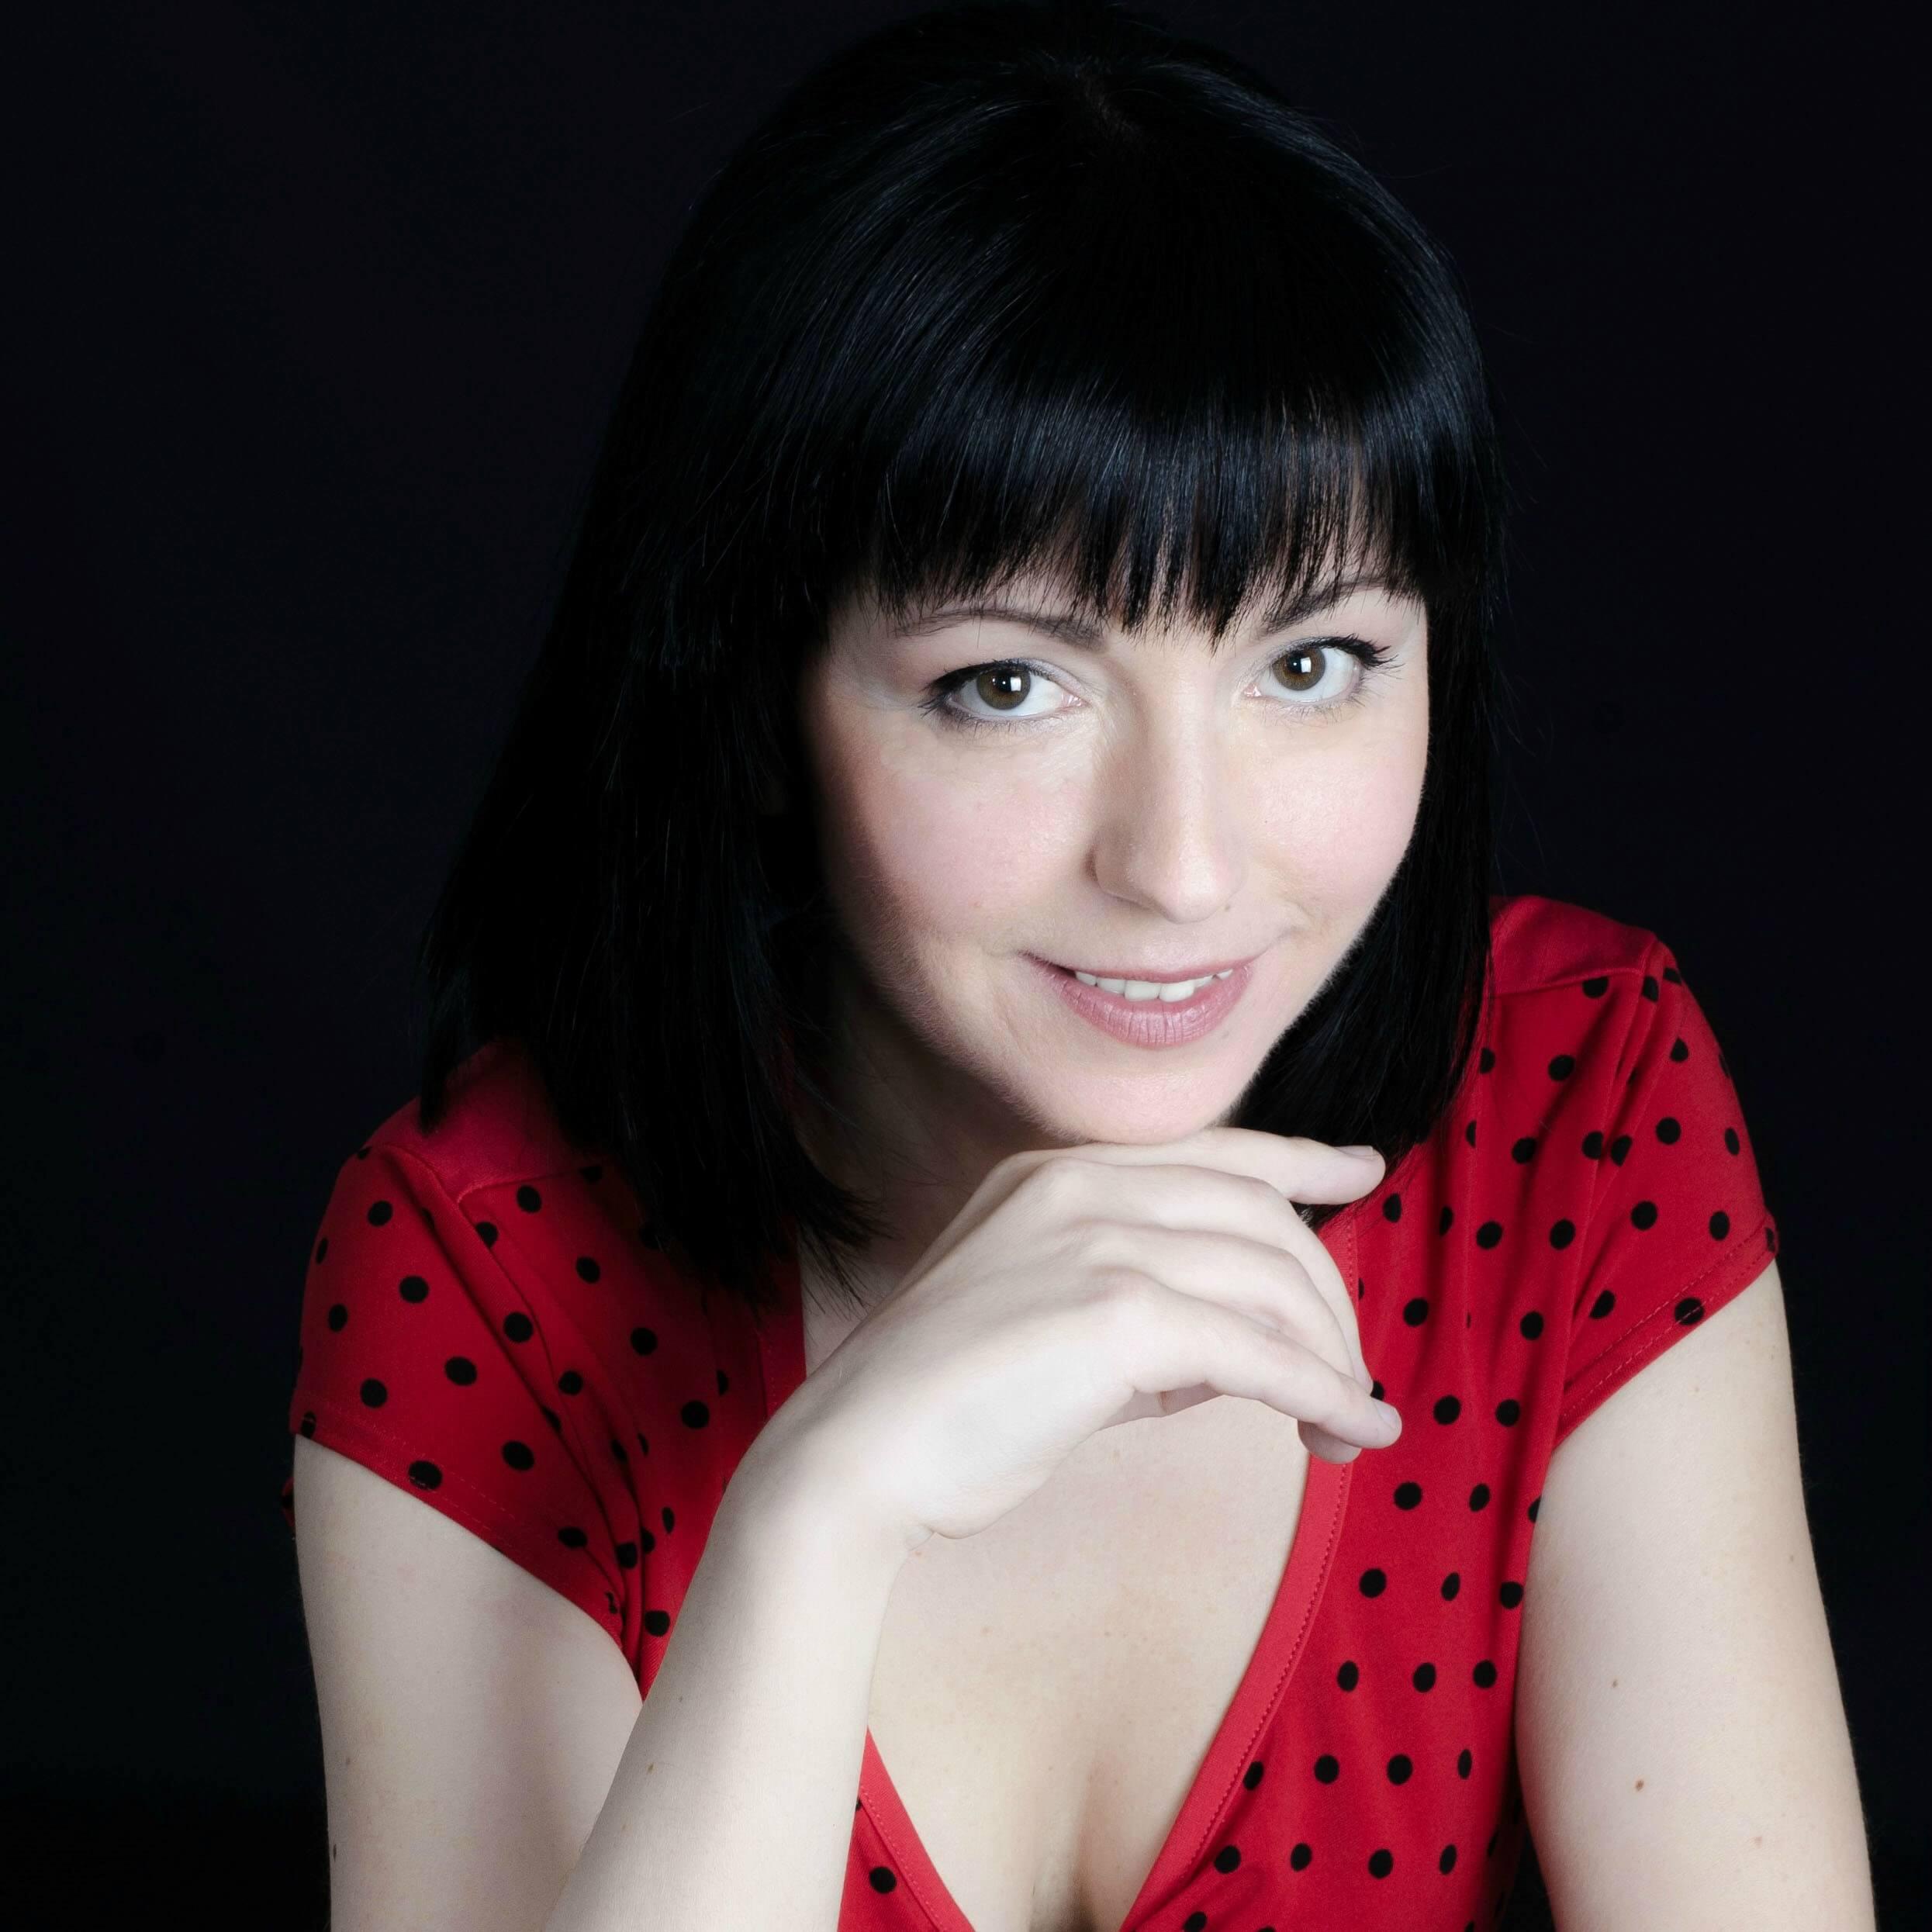 Sabrina Rondinelli foto